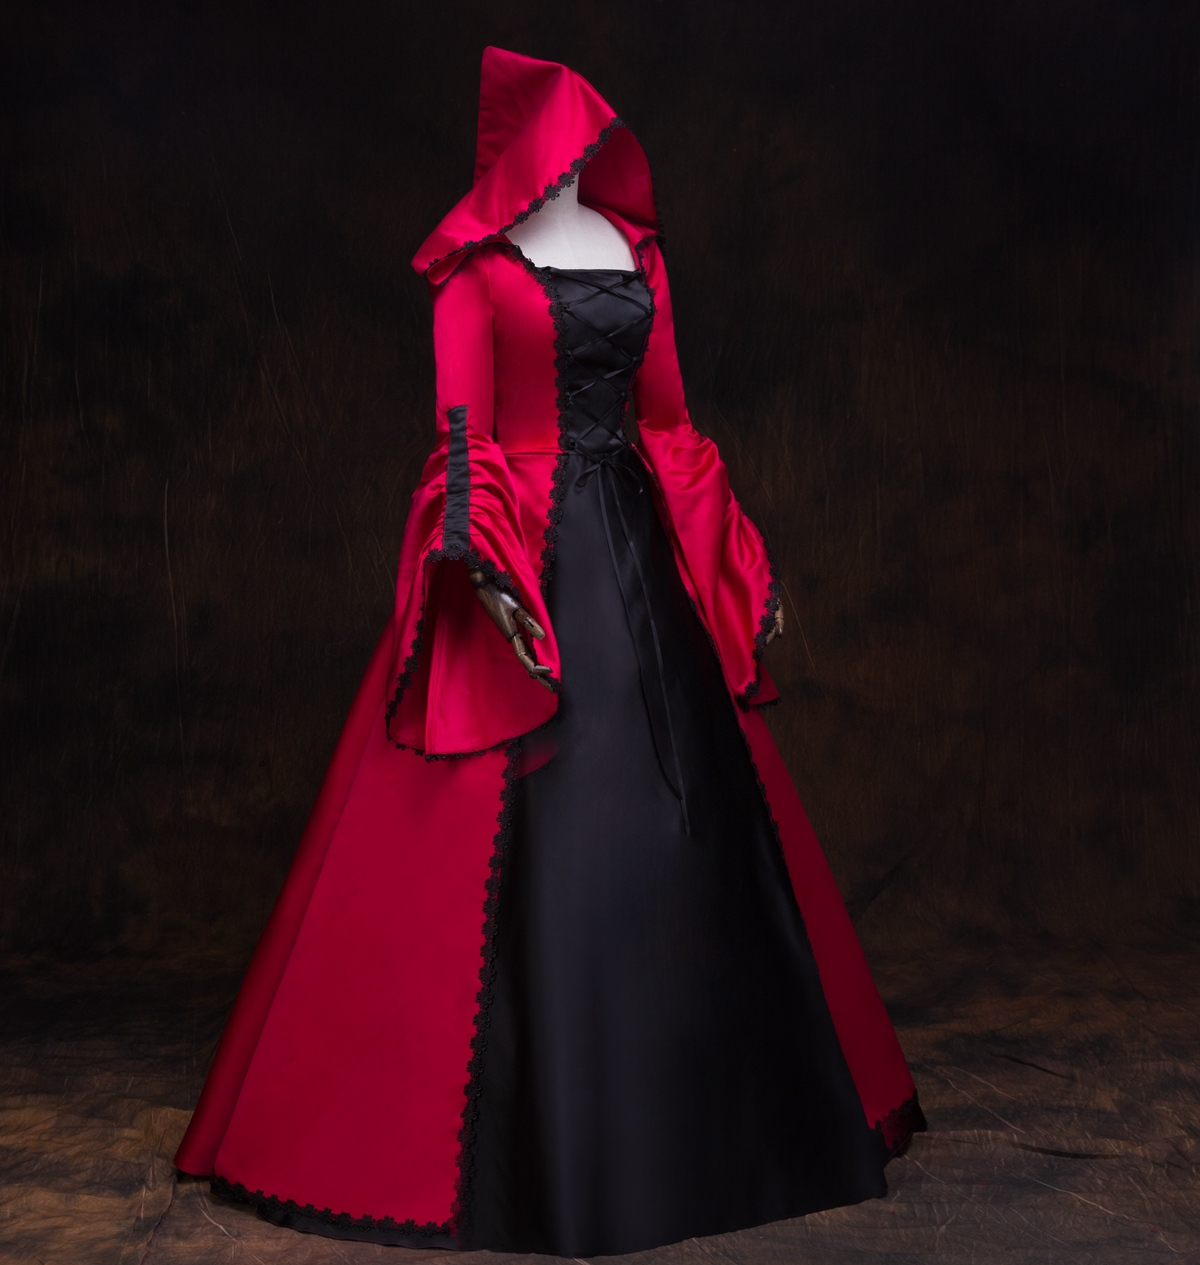 Costumes d'halloween pour femmes costumes de sorcière robe d'halloween robe gothique lolita robe victorienne costumes lolita cosplay vampire